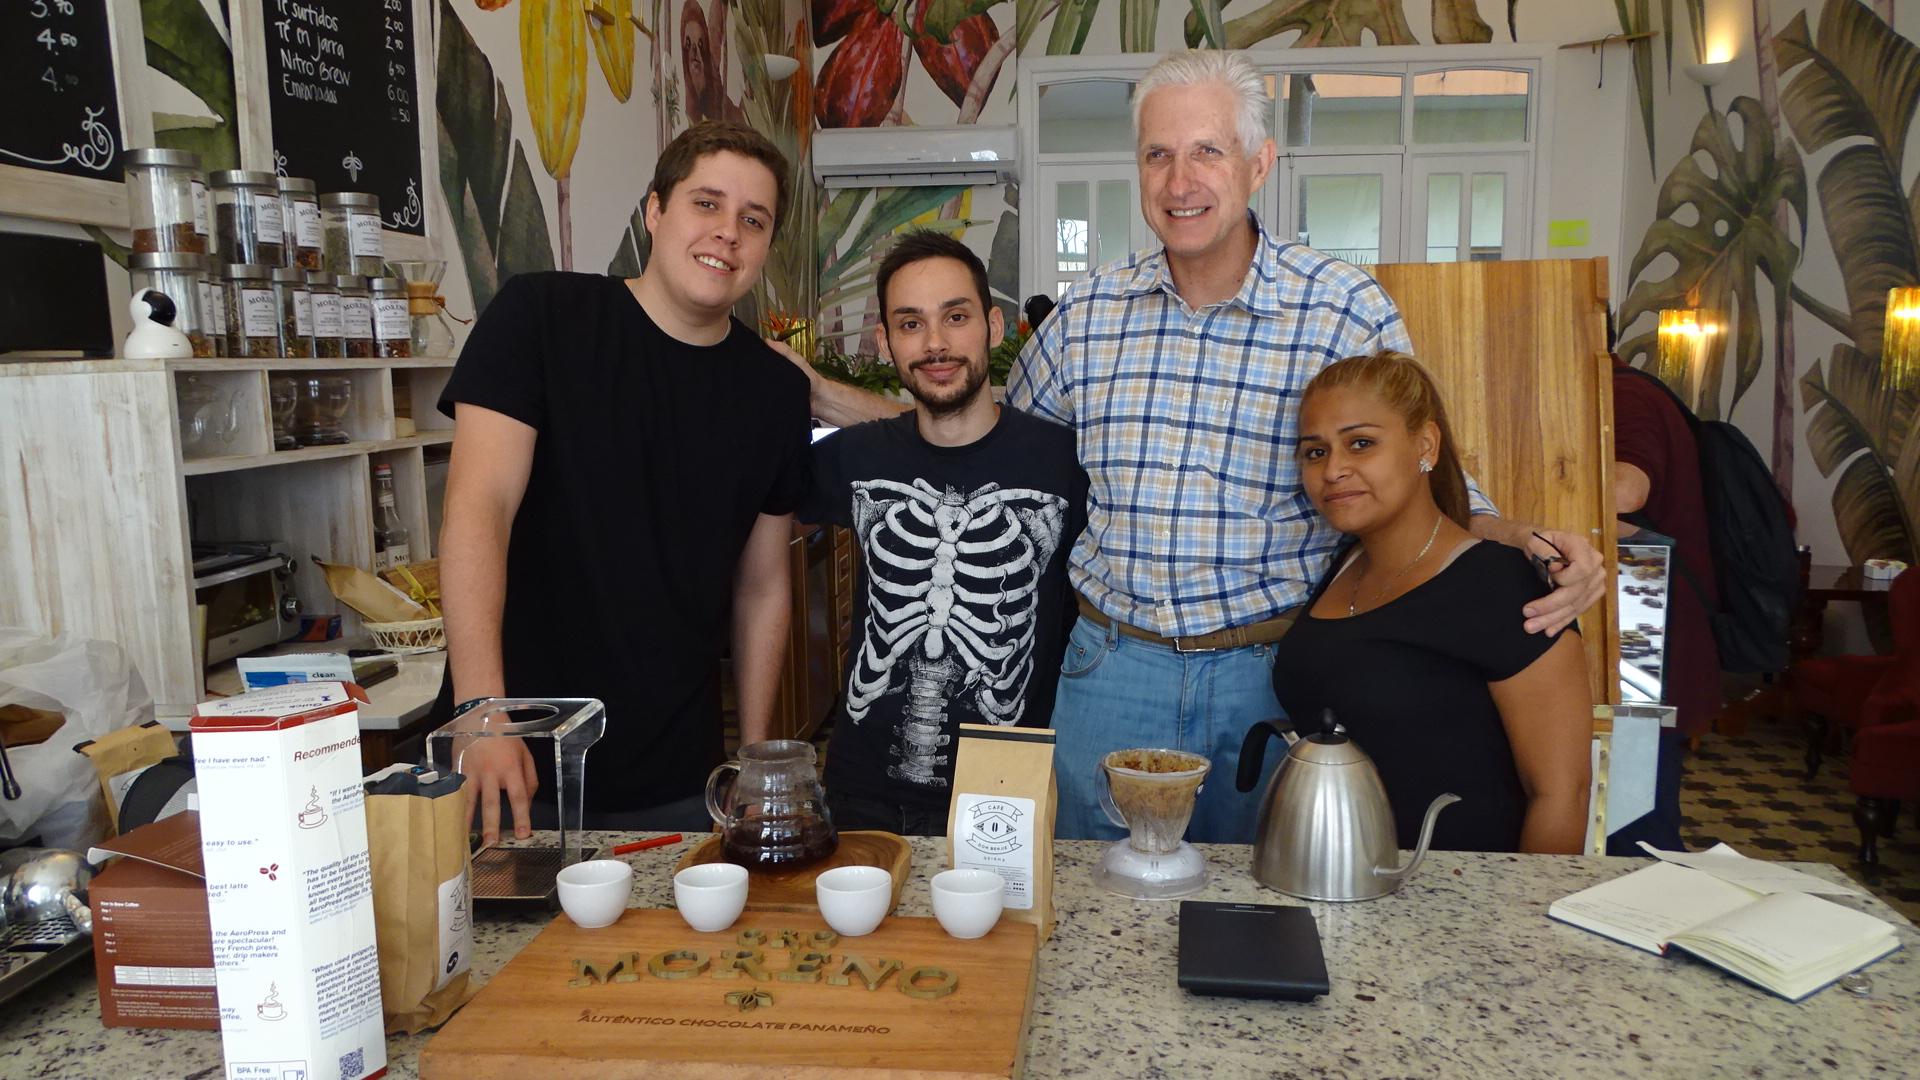 Das Team: Johanes Müller, Jonathan Vaz (Barista), Stefan Müller (Café Don Benji) und Yurianis Colindre. Foto: ForestFinance